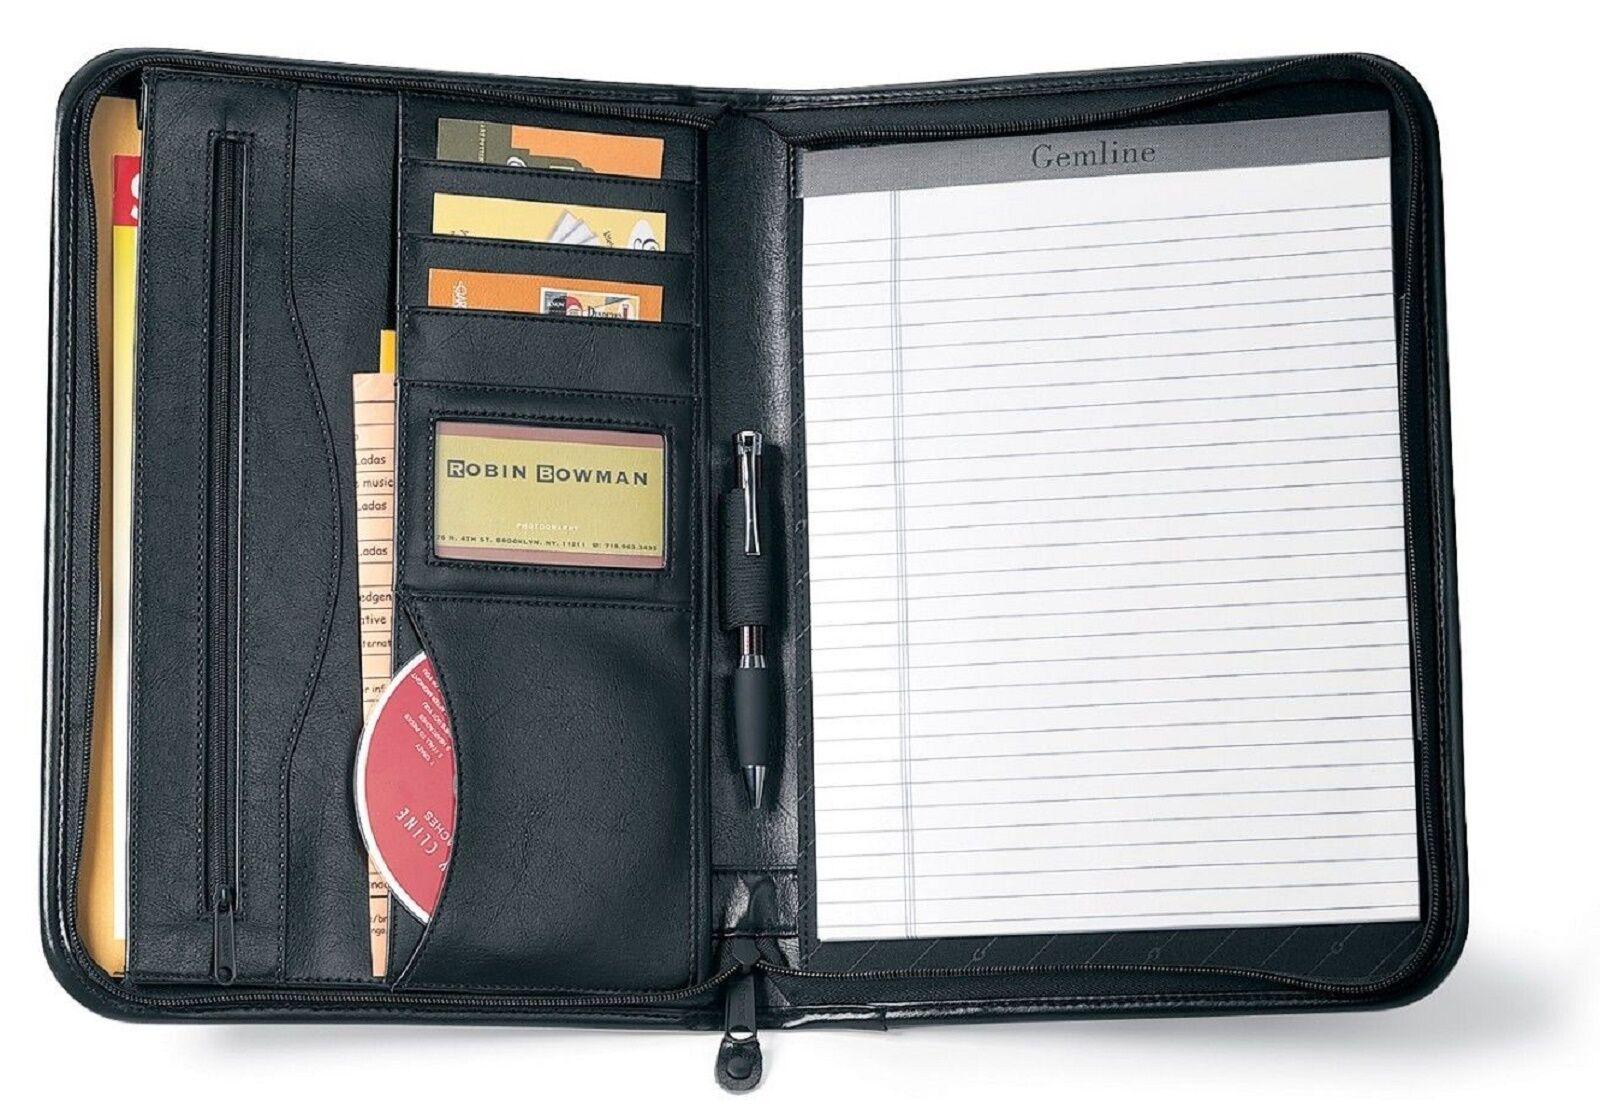 Gemline Deluxe Executive Vintage Black Leather Zippered Padf